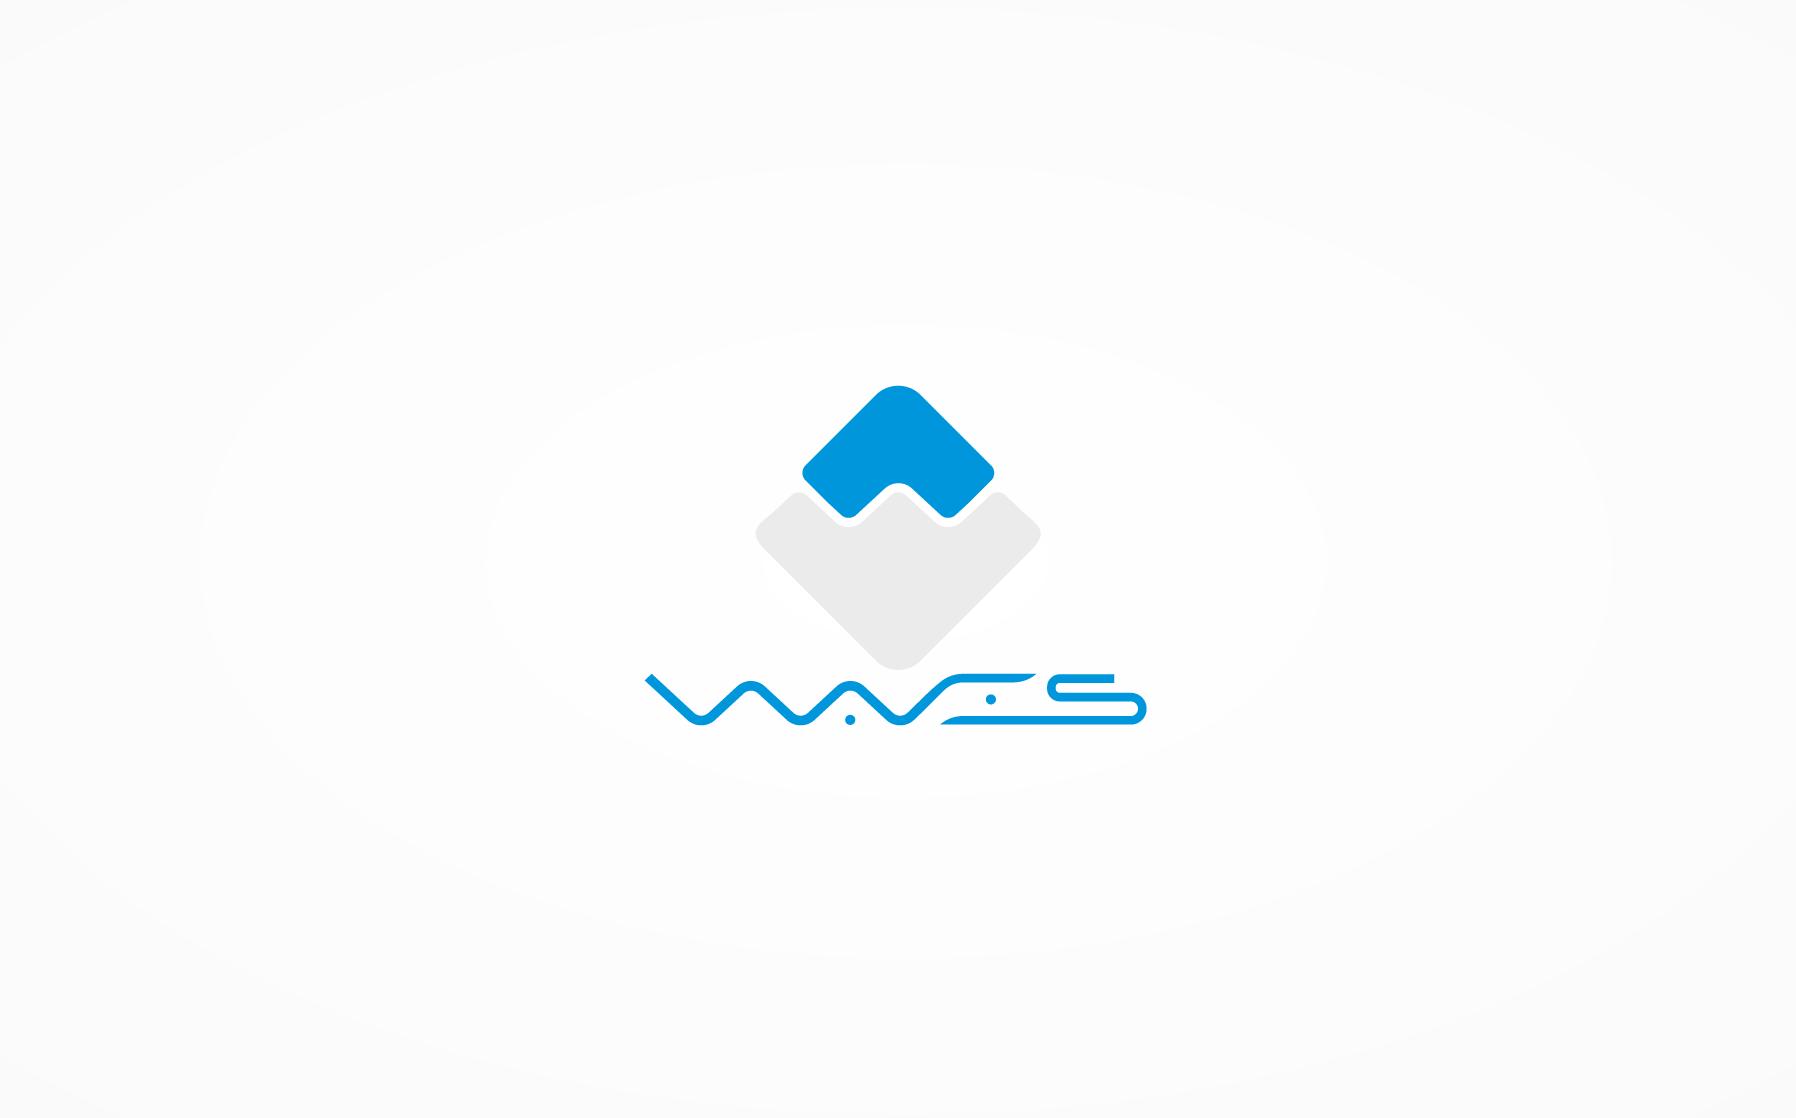 Waves добавлены на биржу KUNA